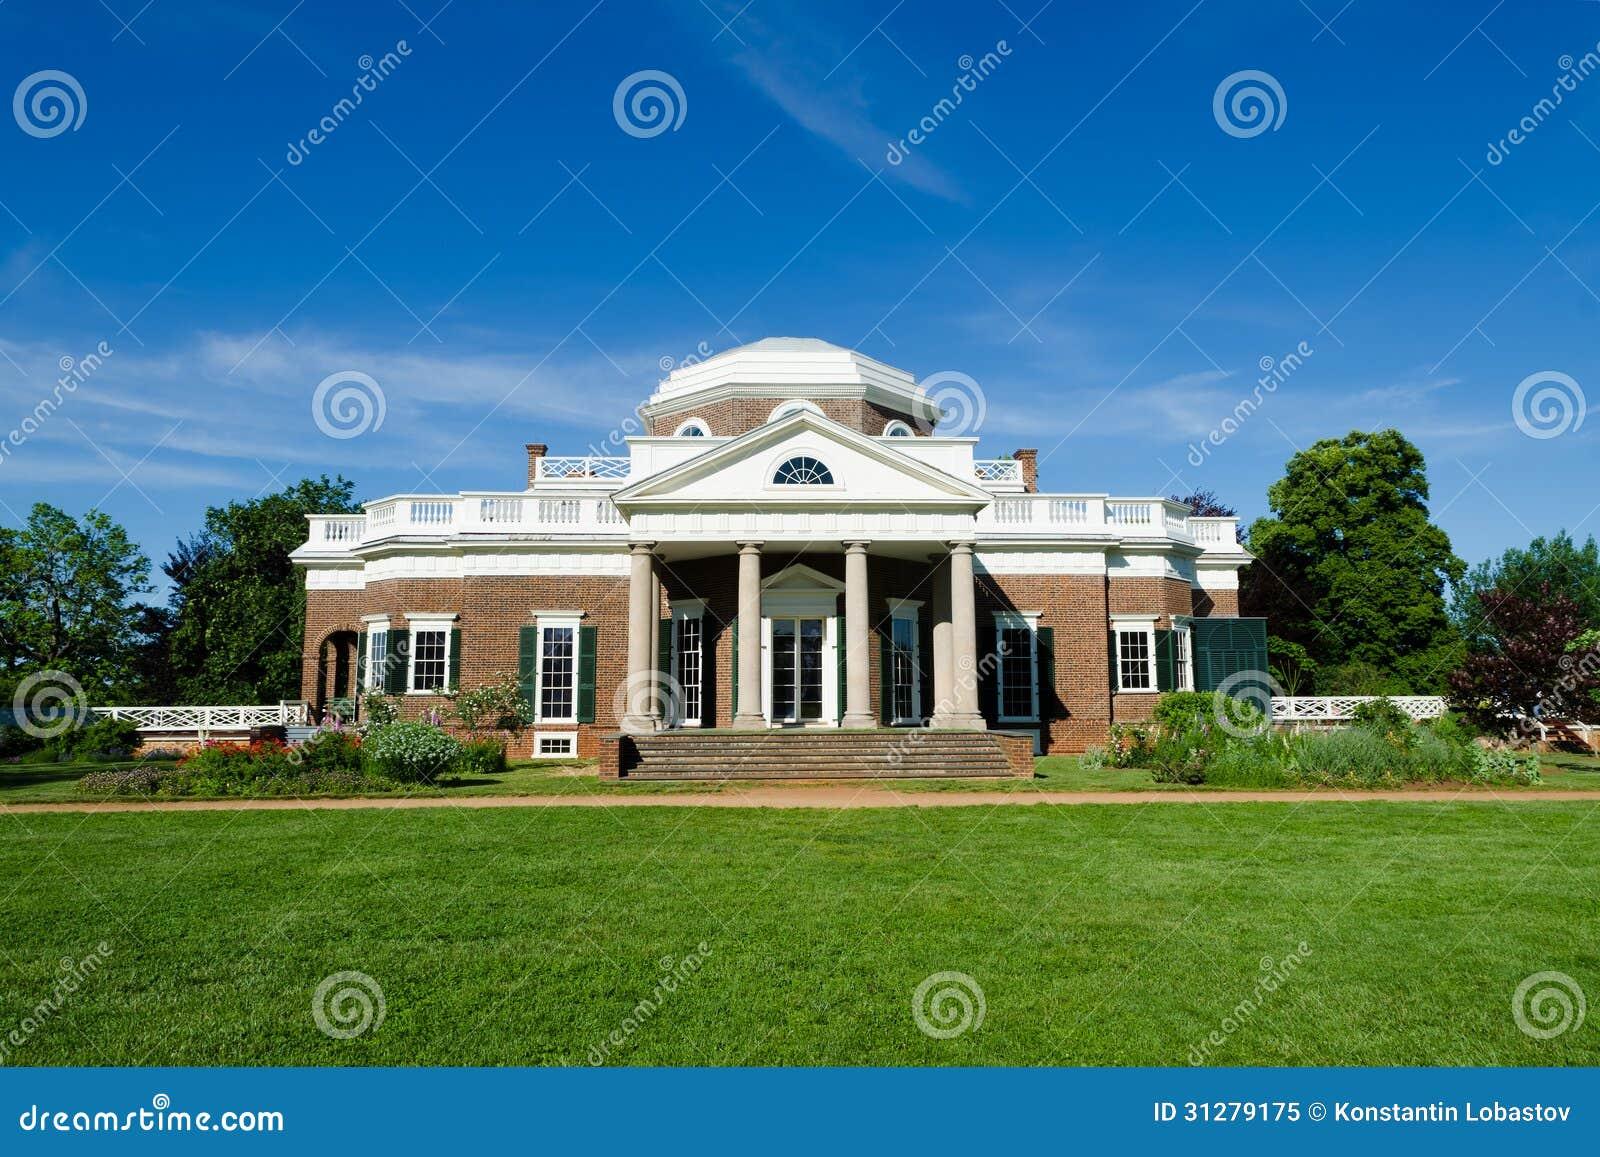 Thomas Jefferson S Monticello Stock Image Image Of House